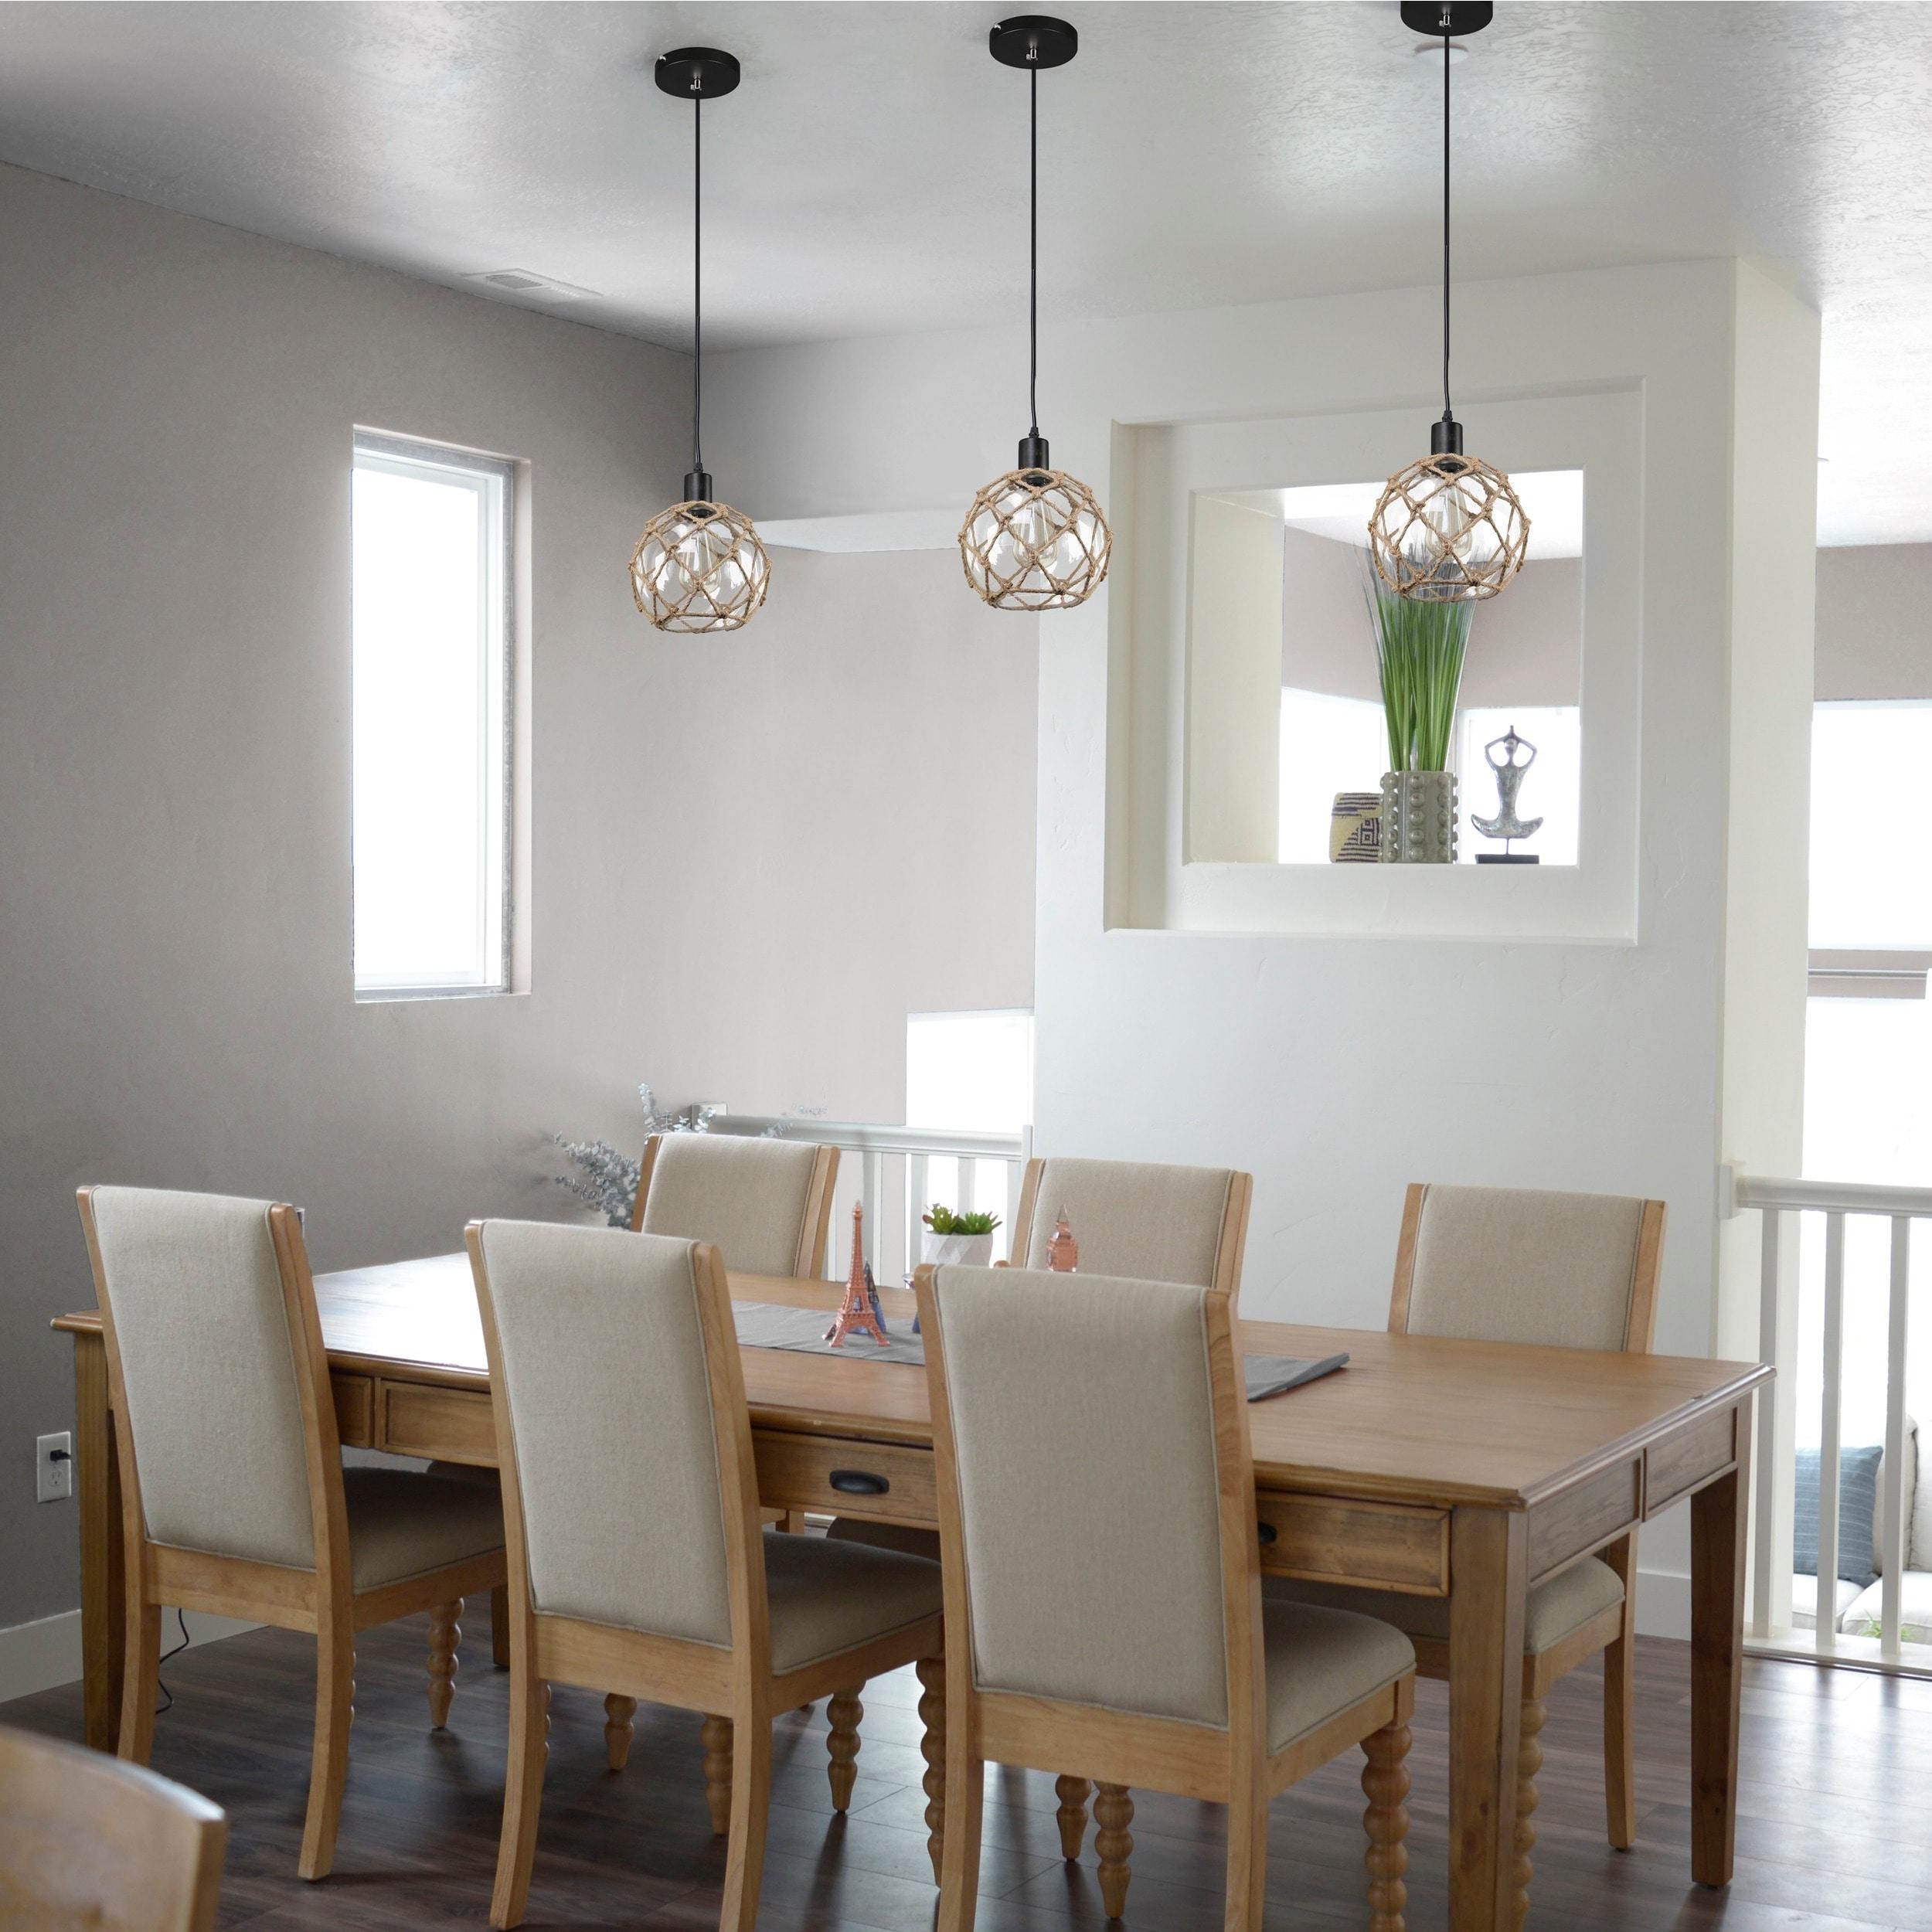 journee lighting. Journee Home \u0027Nura\u0027 8 In Hard Wired Glass Hemp Net Pendant Light - Free Shipping Today Overstock 20677831 Lighting O